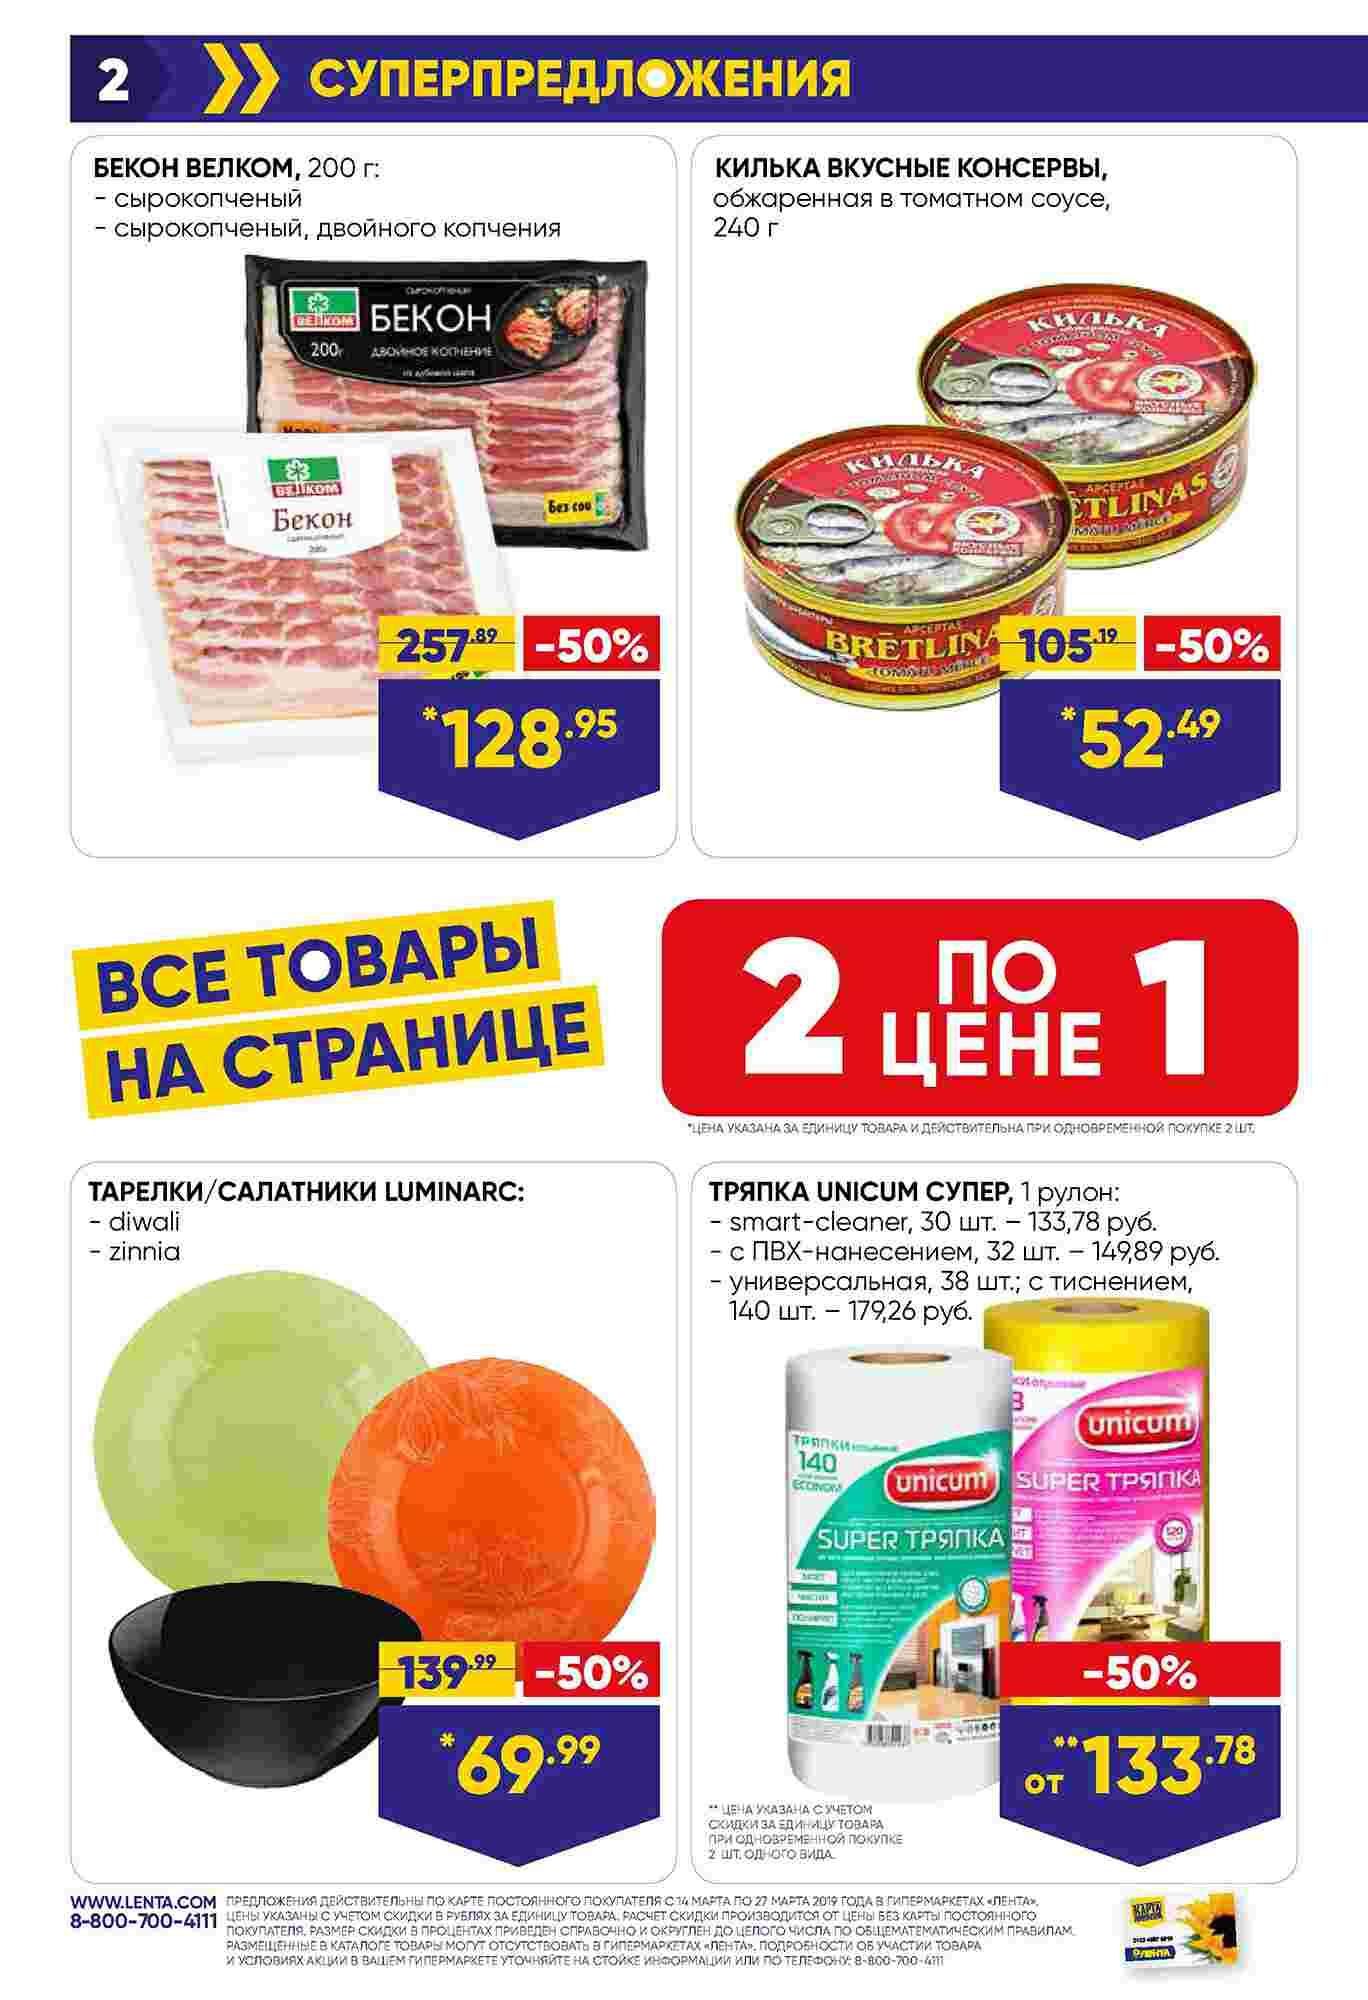 Каталог Лента гипермаркет 14-27.03.2019 стр. - 0001 - 0002